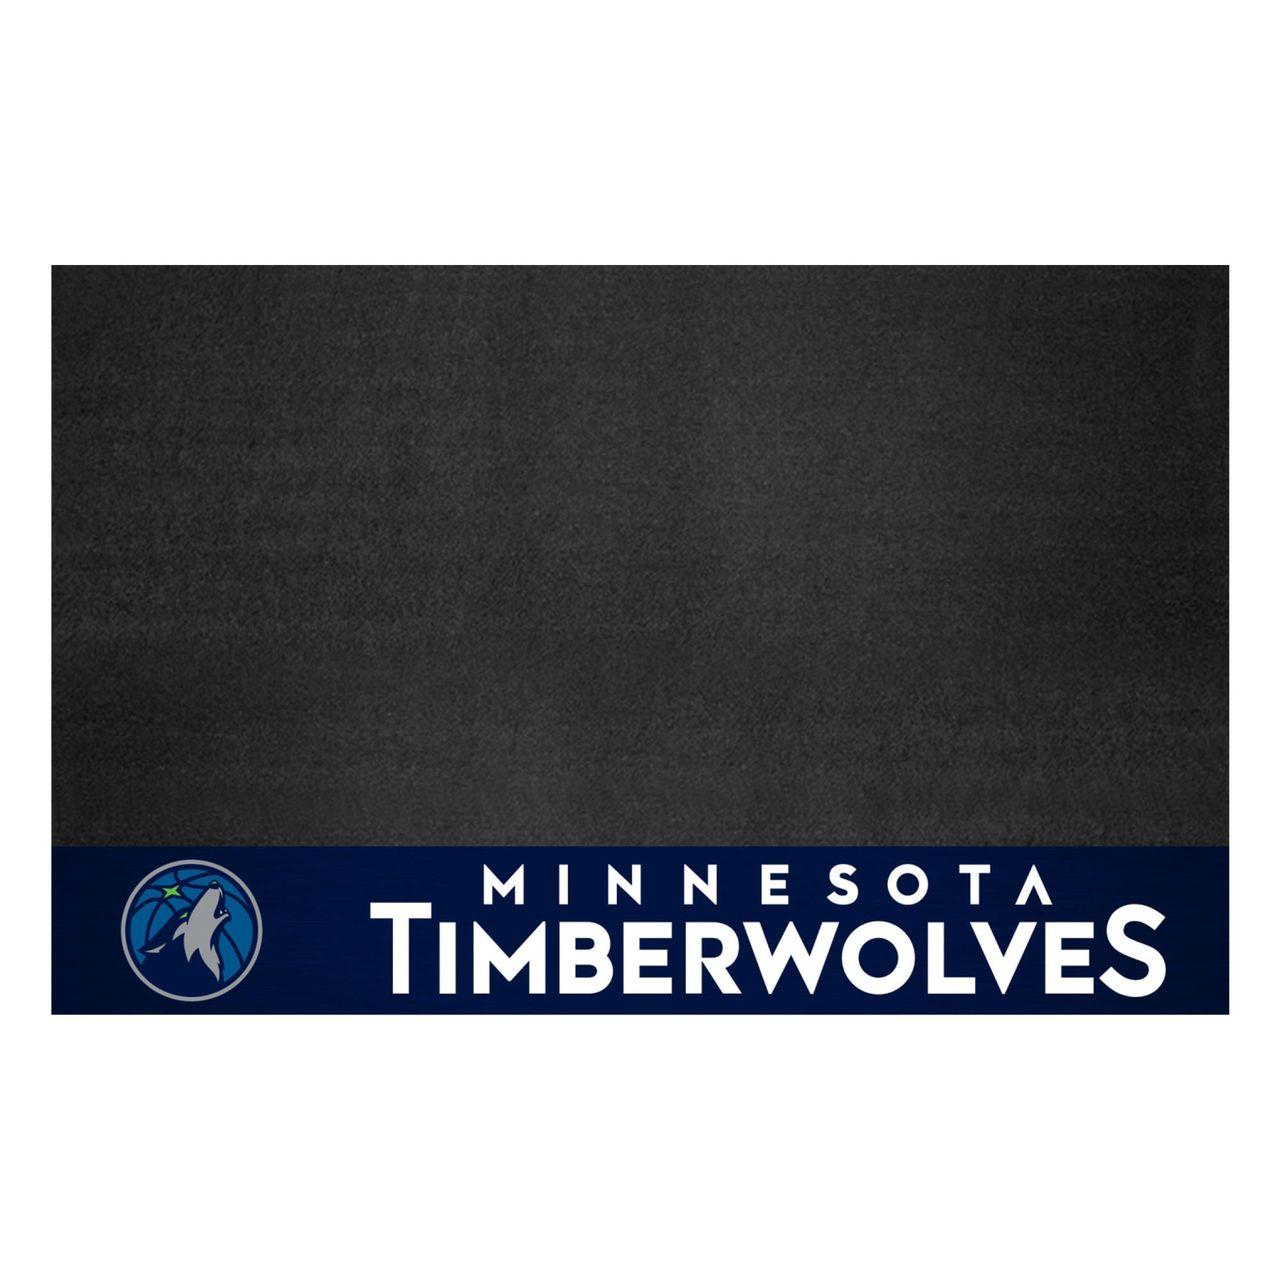 "Fanmats 14212 NBA - Minnesota Timberwolves Grill Mat 26""x42"""